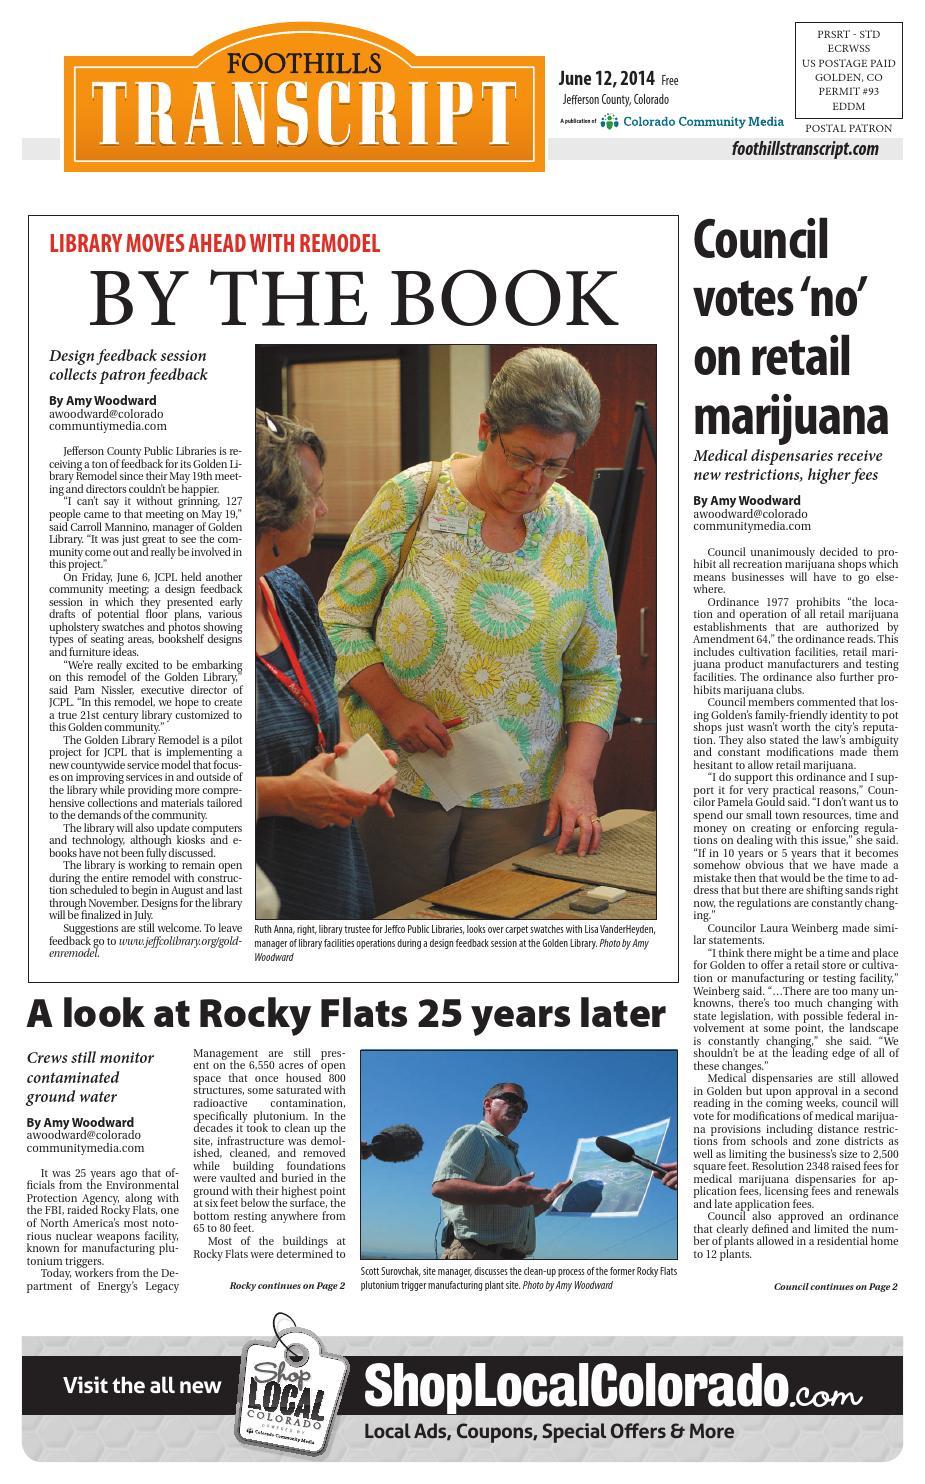 Foothills transcript 0612 by Colorado Community Media - issuu